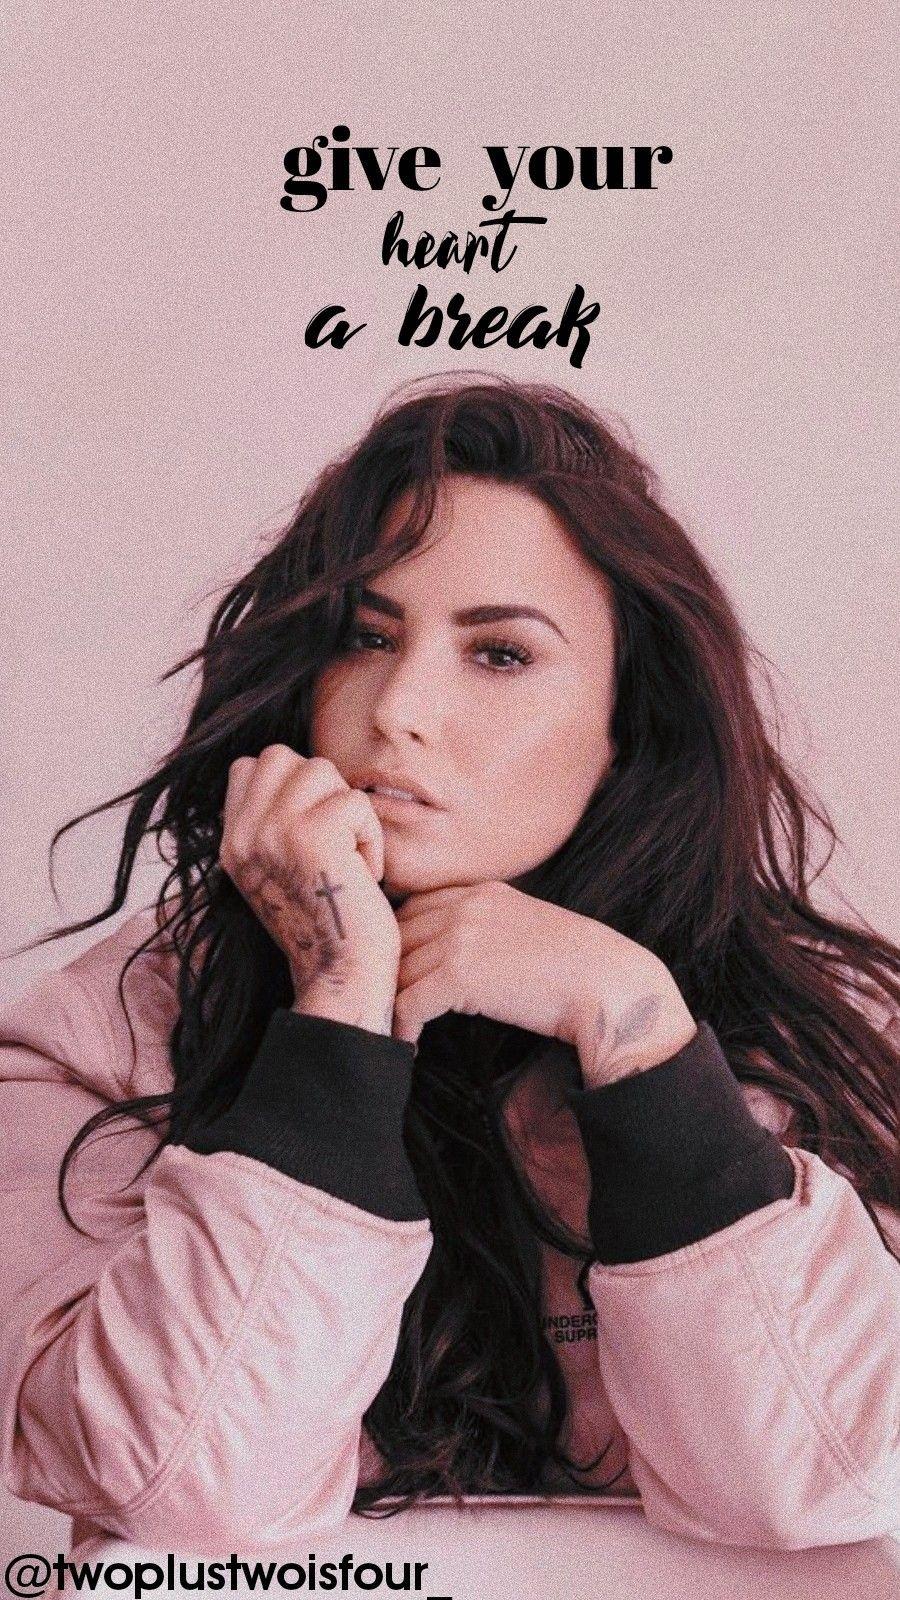 Demi Lovato Wallpaper Demilovato Lovatics Aestheticswallpaper Aesthetic Demi Lovato Lovato Light Wall Art